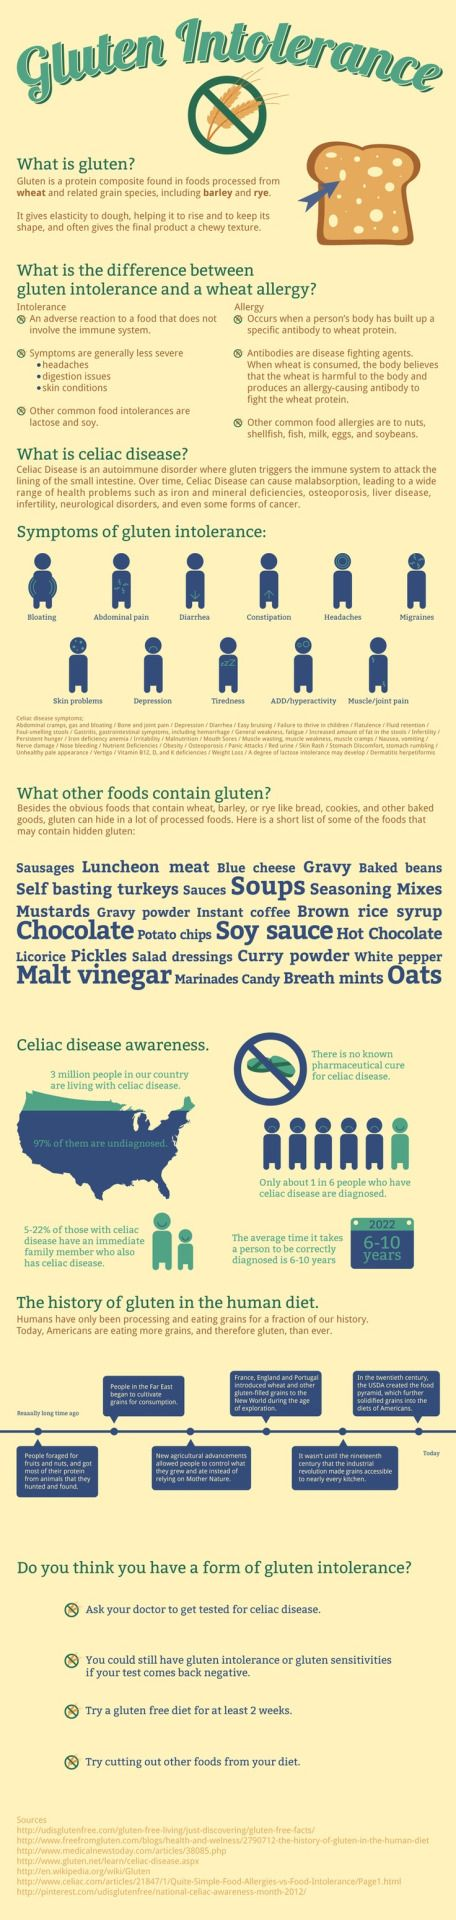 For more treasures like this- Like us on http://fb.me/IntoGlutenFree: IntoGlutenFree.com #IntoGlutenFree - celiac disease, coeliac disease, gluten free diet, wheat free diet, gluten intolerance, gluten sensitivity, gluten allergy.